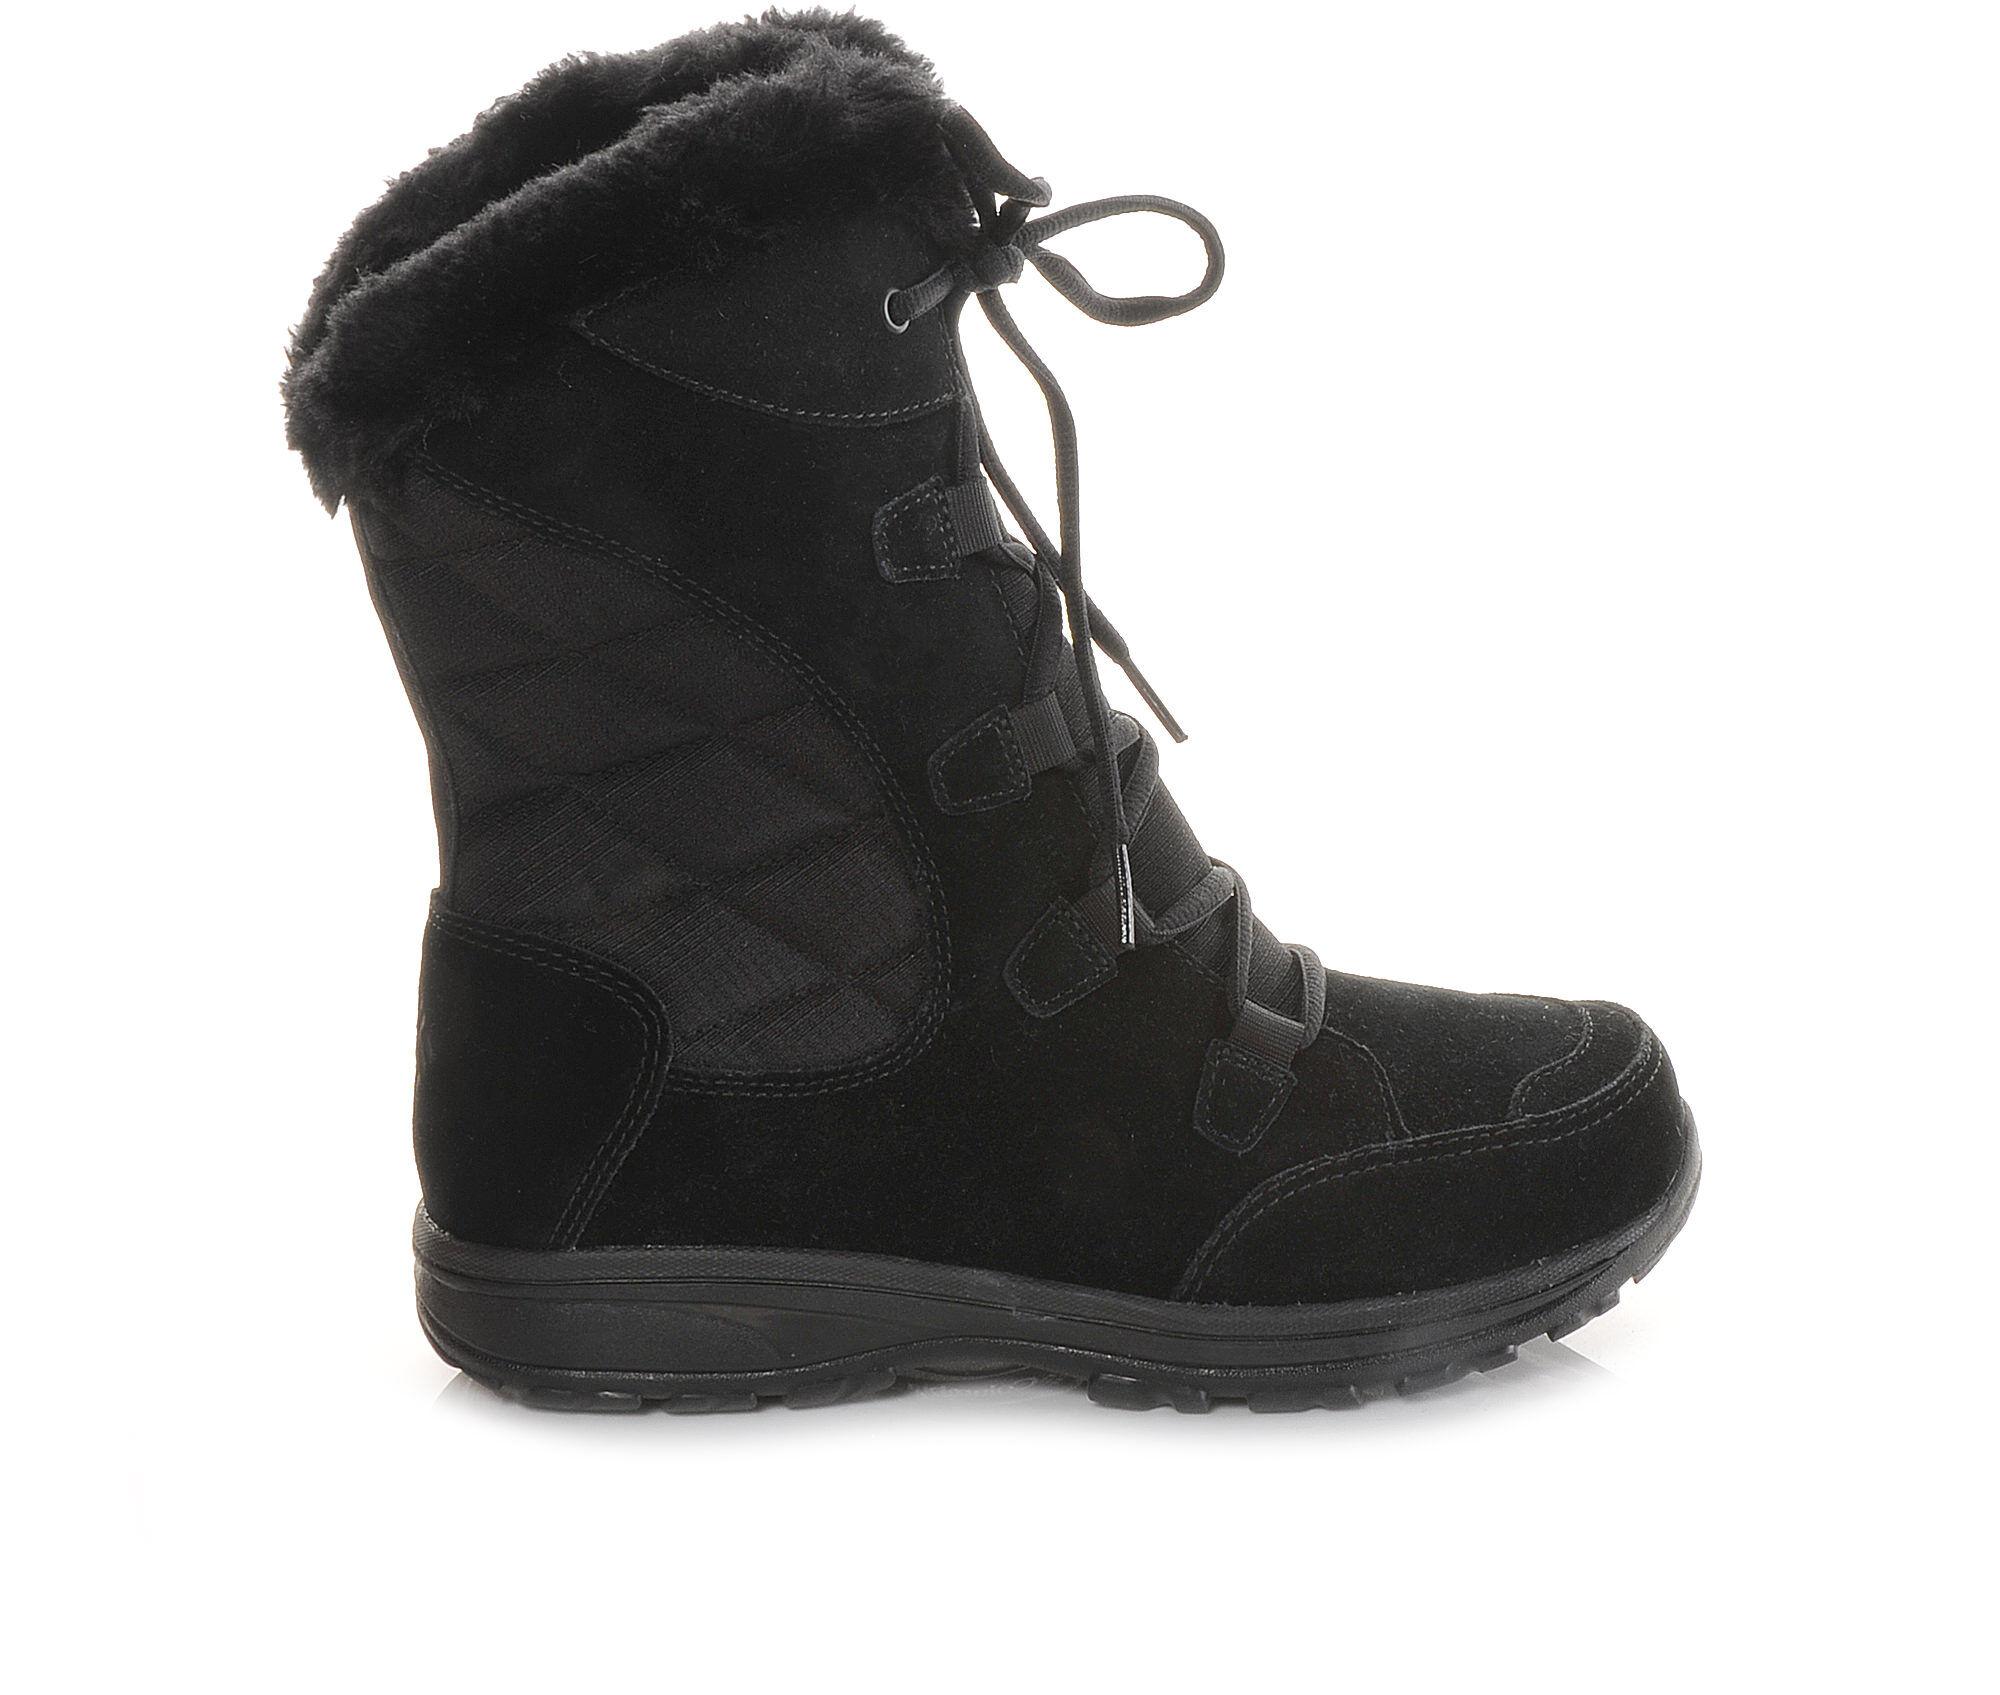 Women's Columbia Ice Maiden Winter Boots Black/Grey